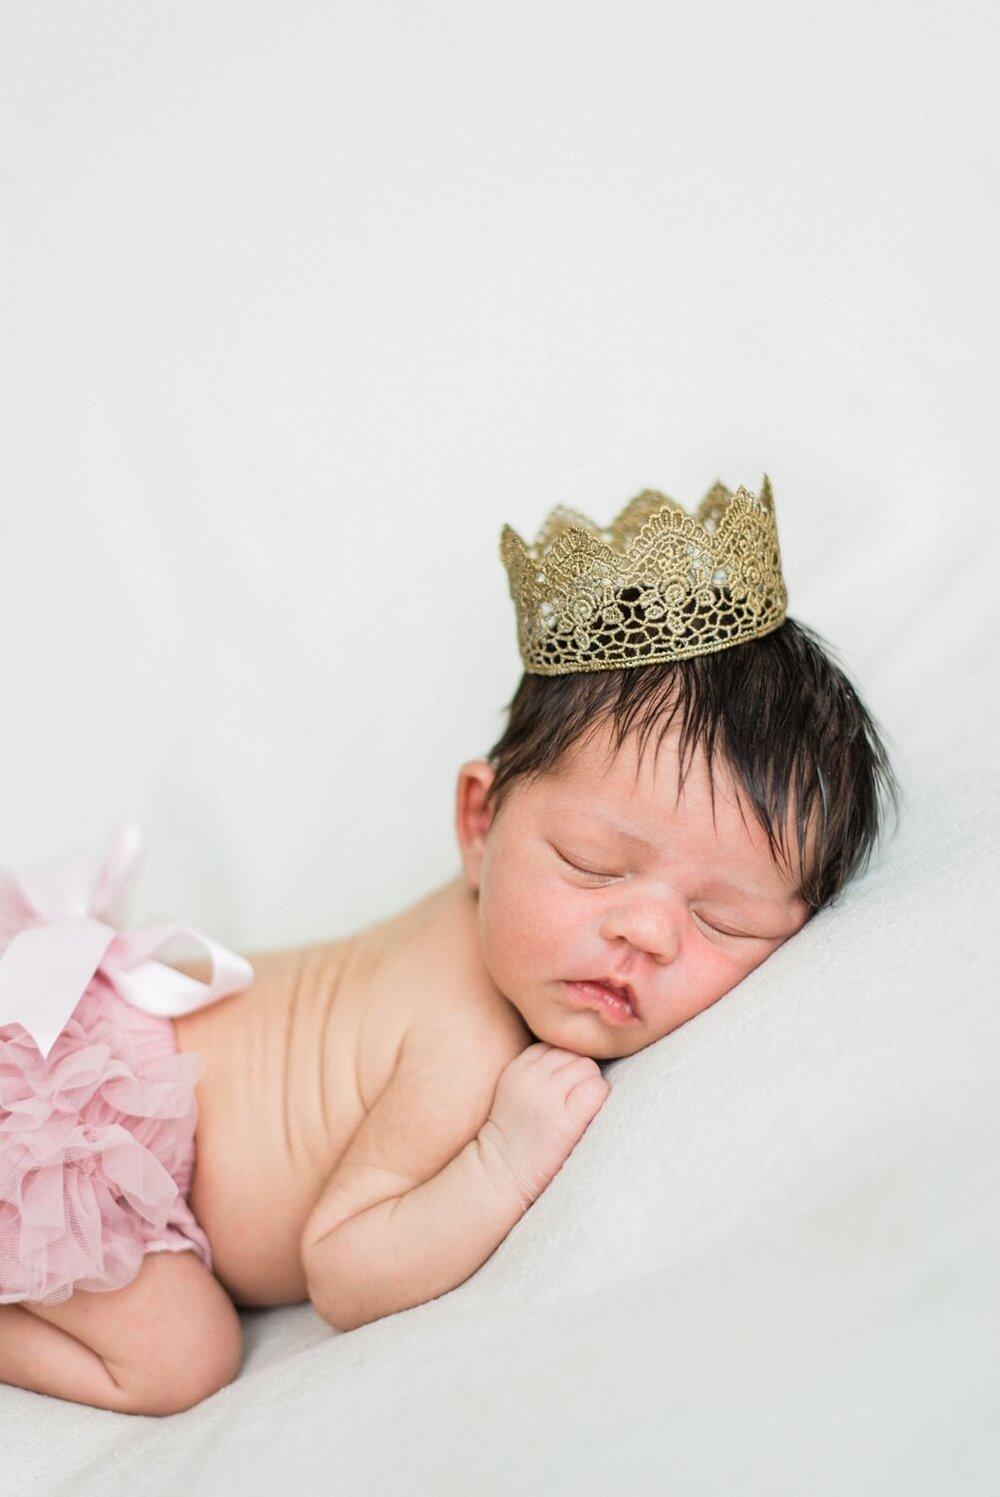 portland-oregon-newborn-photographer-sleeping-baby-girl-in-crown-shelley-marie-photography-2.jpg